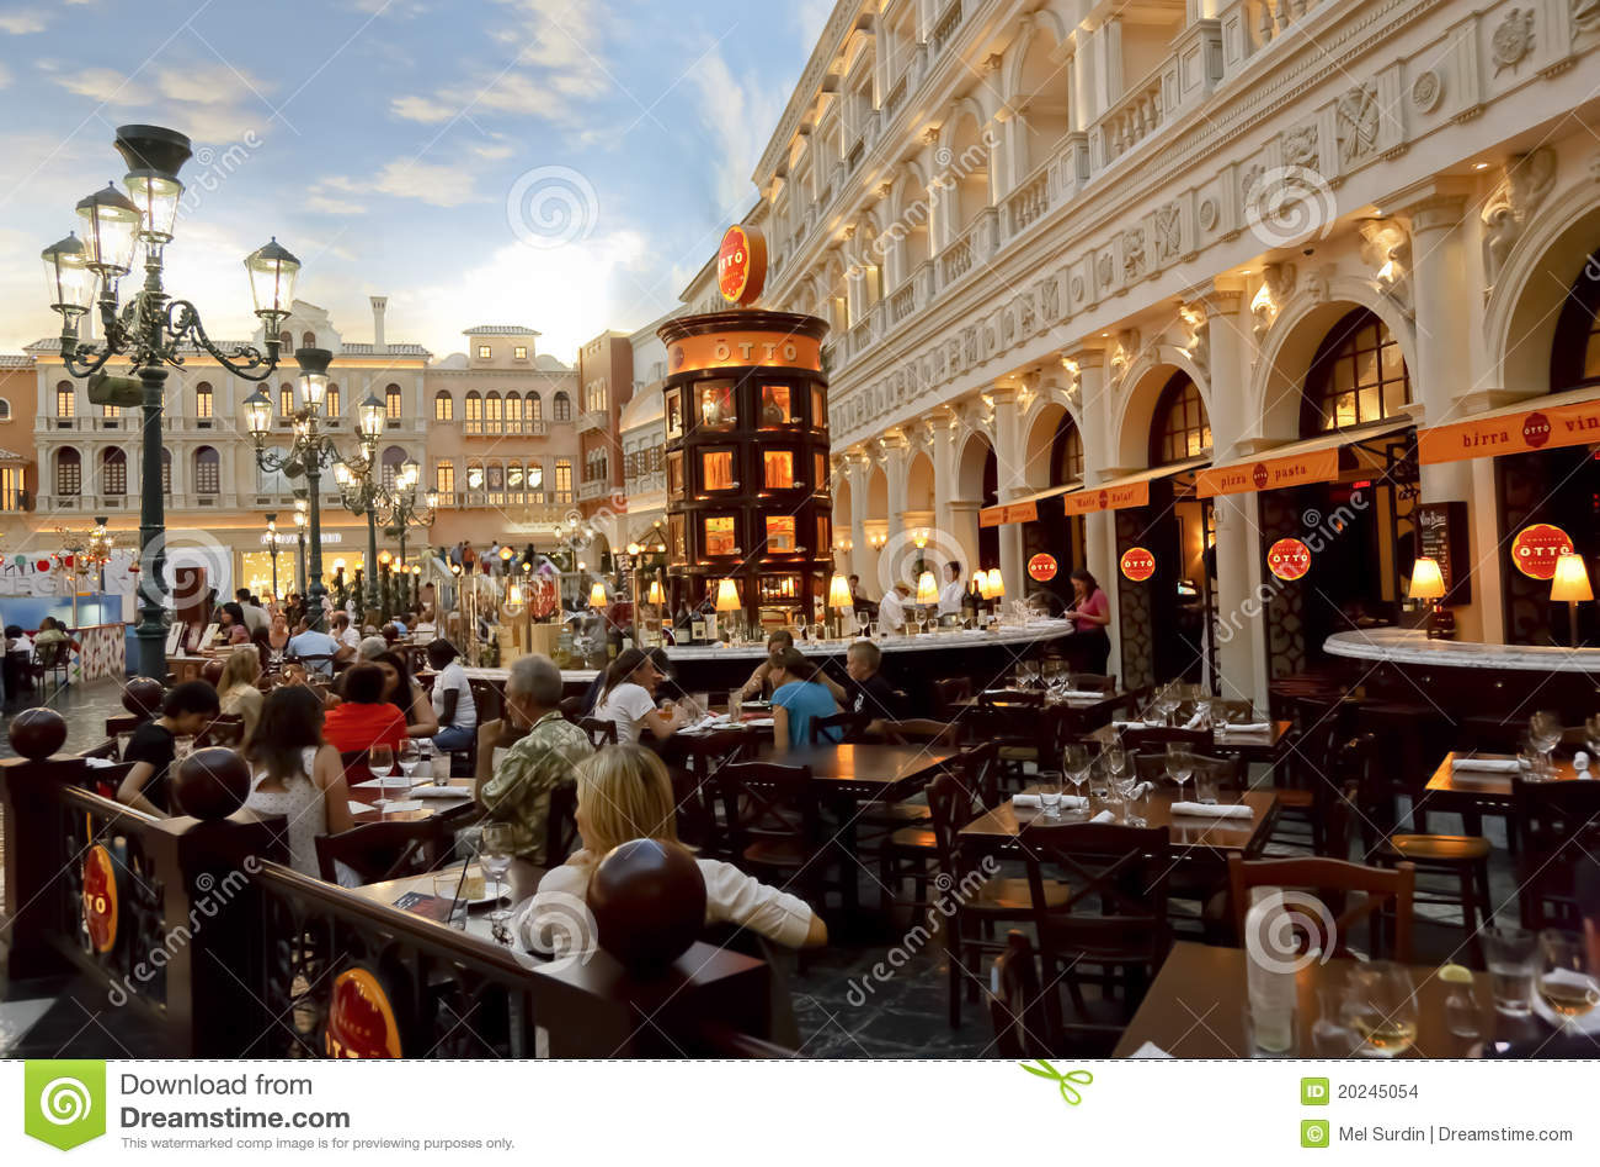 Otto Pizza Venetian Hotel Editorial Stock Image Image Of